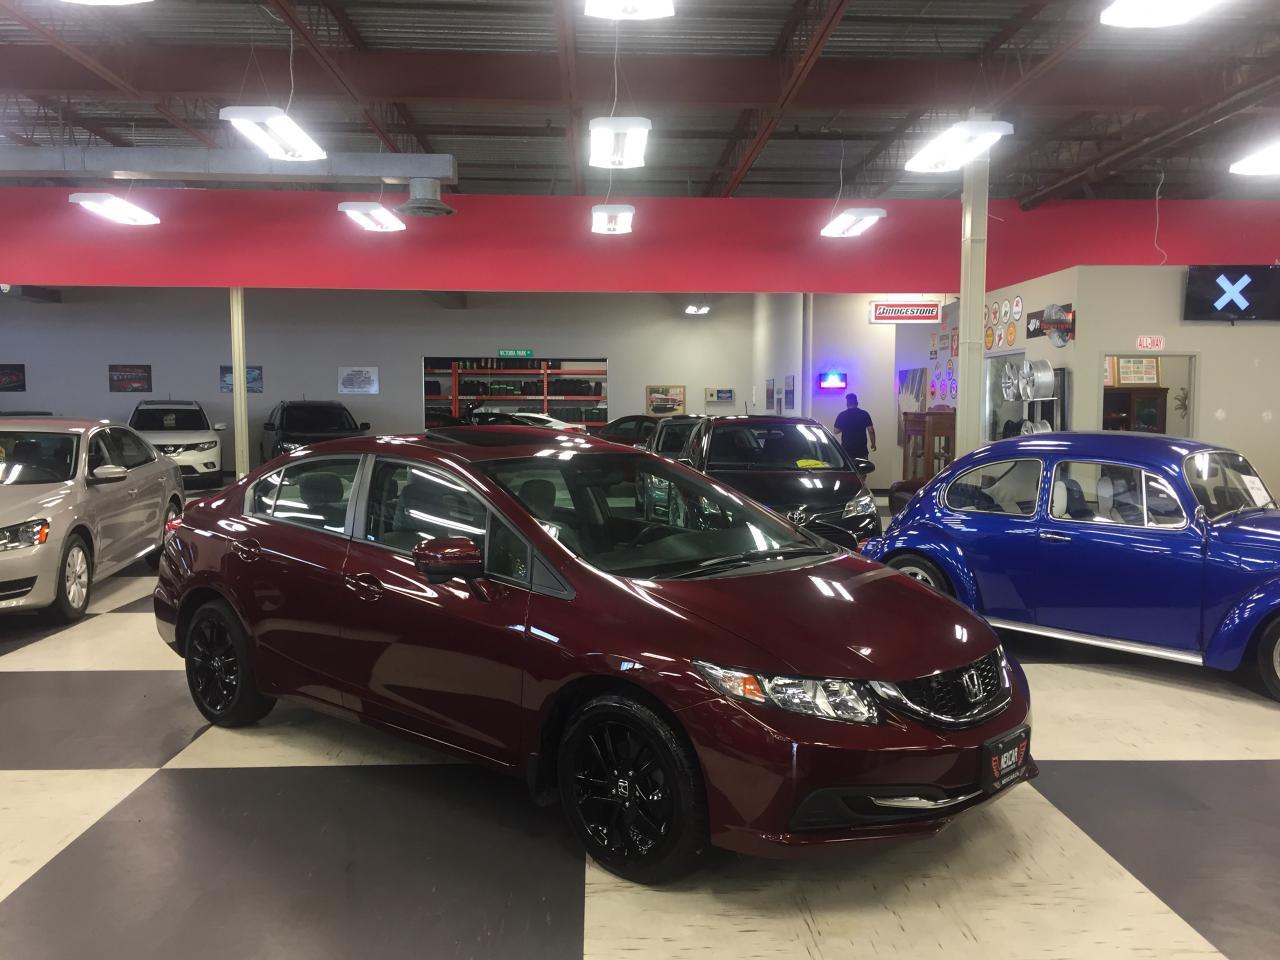 2014 Honda Civic EX AUT0 A/C SUNROOF BACKUP CAMERA 72K